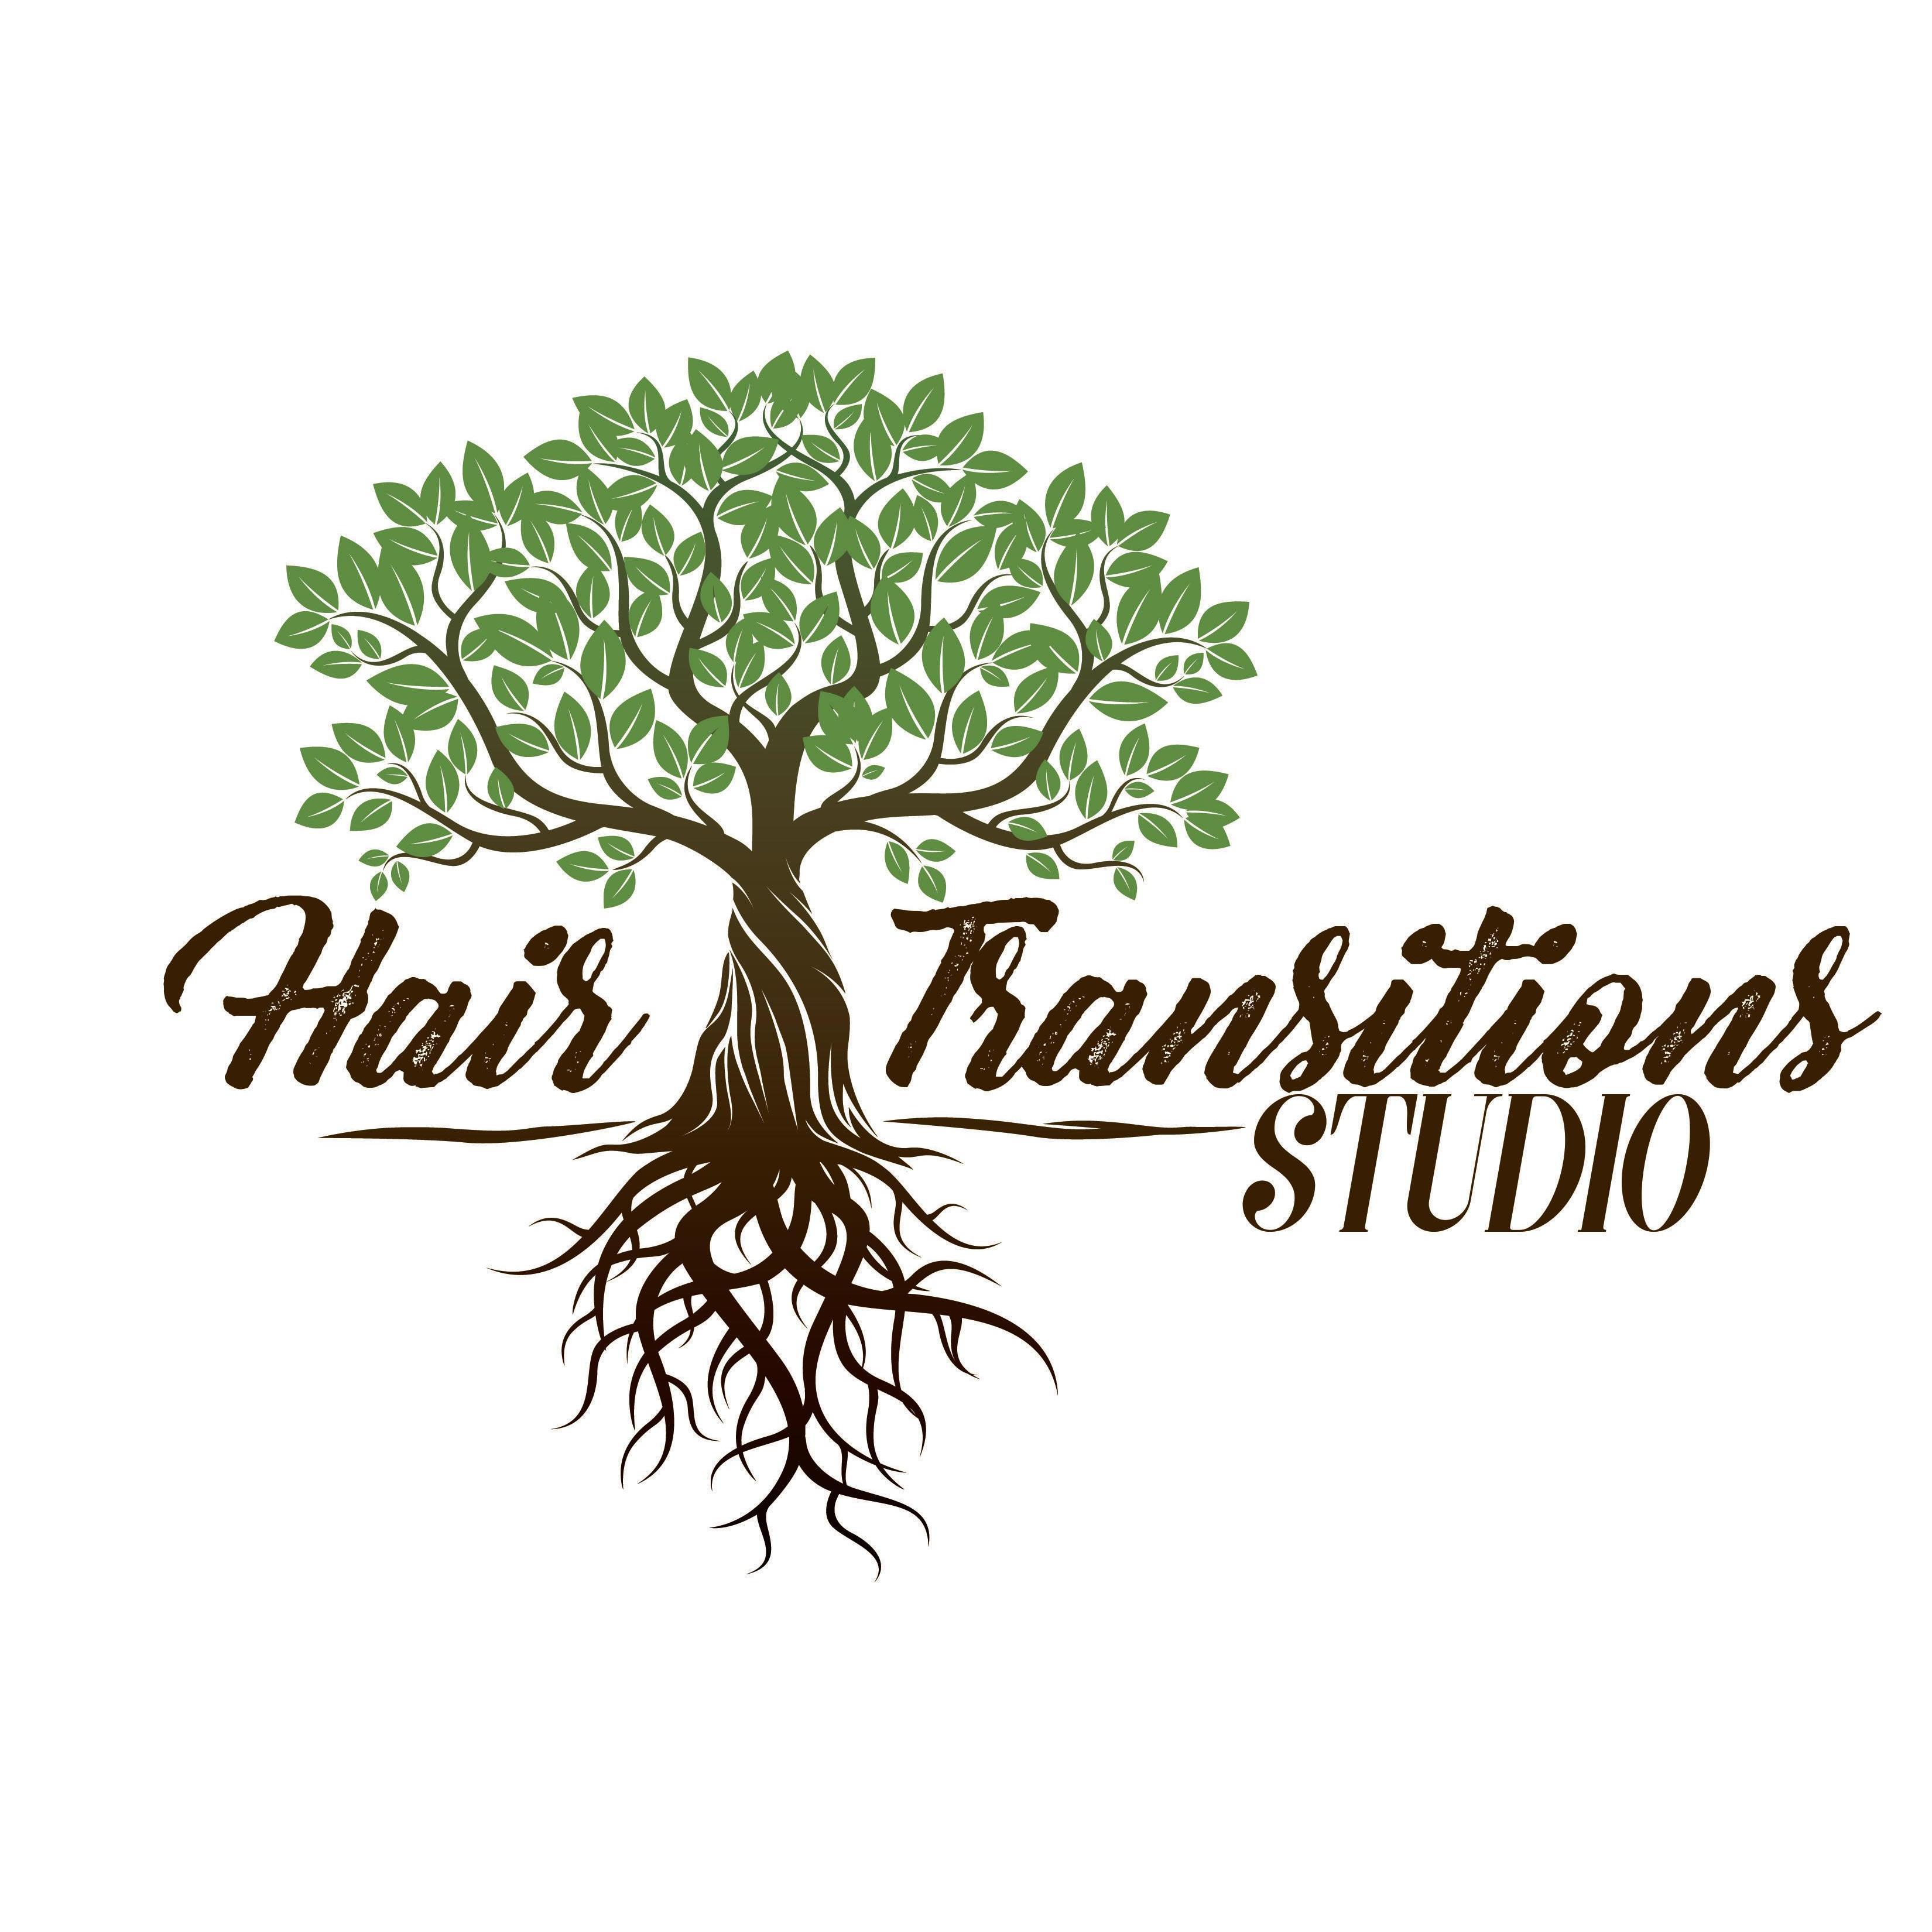 Hair Transitions Studio